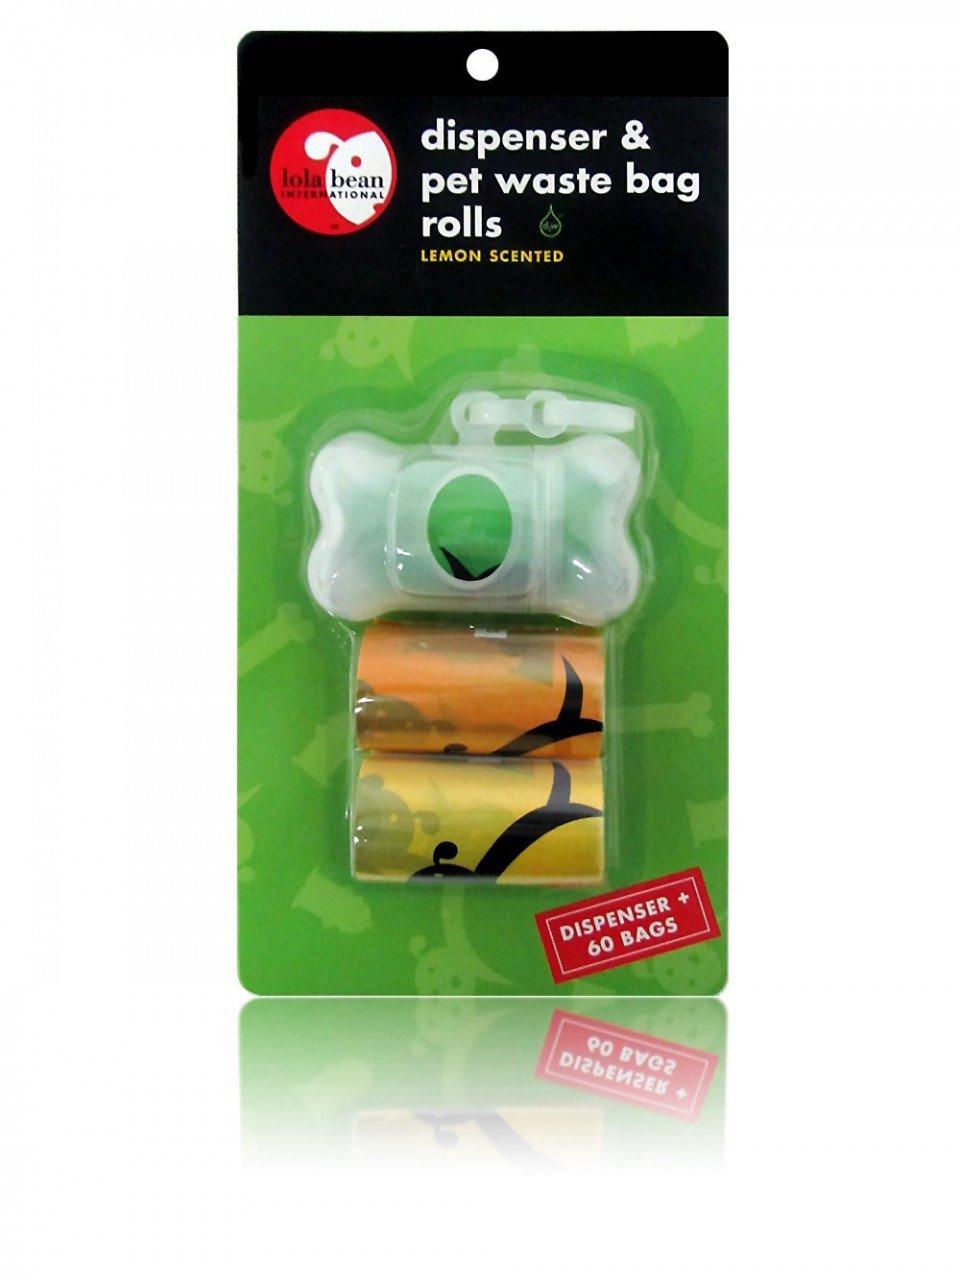 Lola Bean International Transparent Bone Shape Dispenser and Waste Pick Up Bags, Lemon Scented, 60 Count